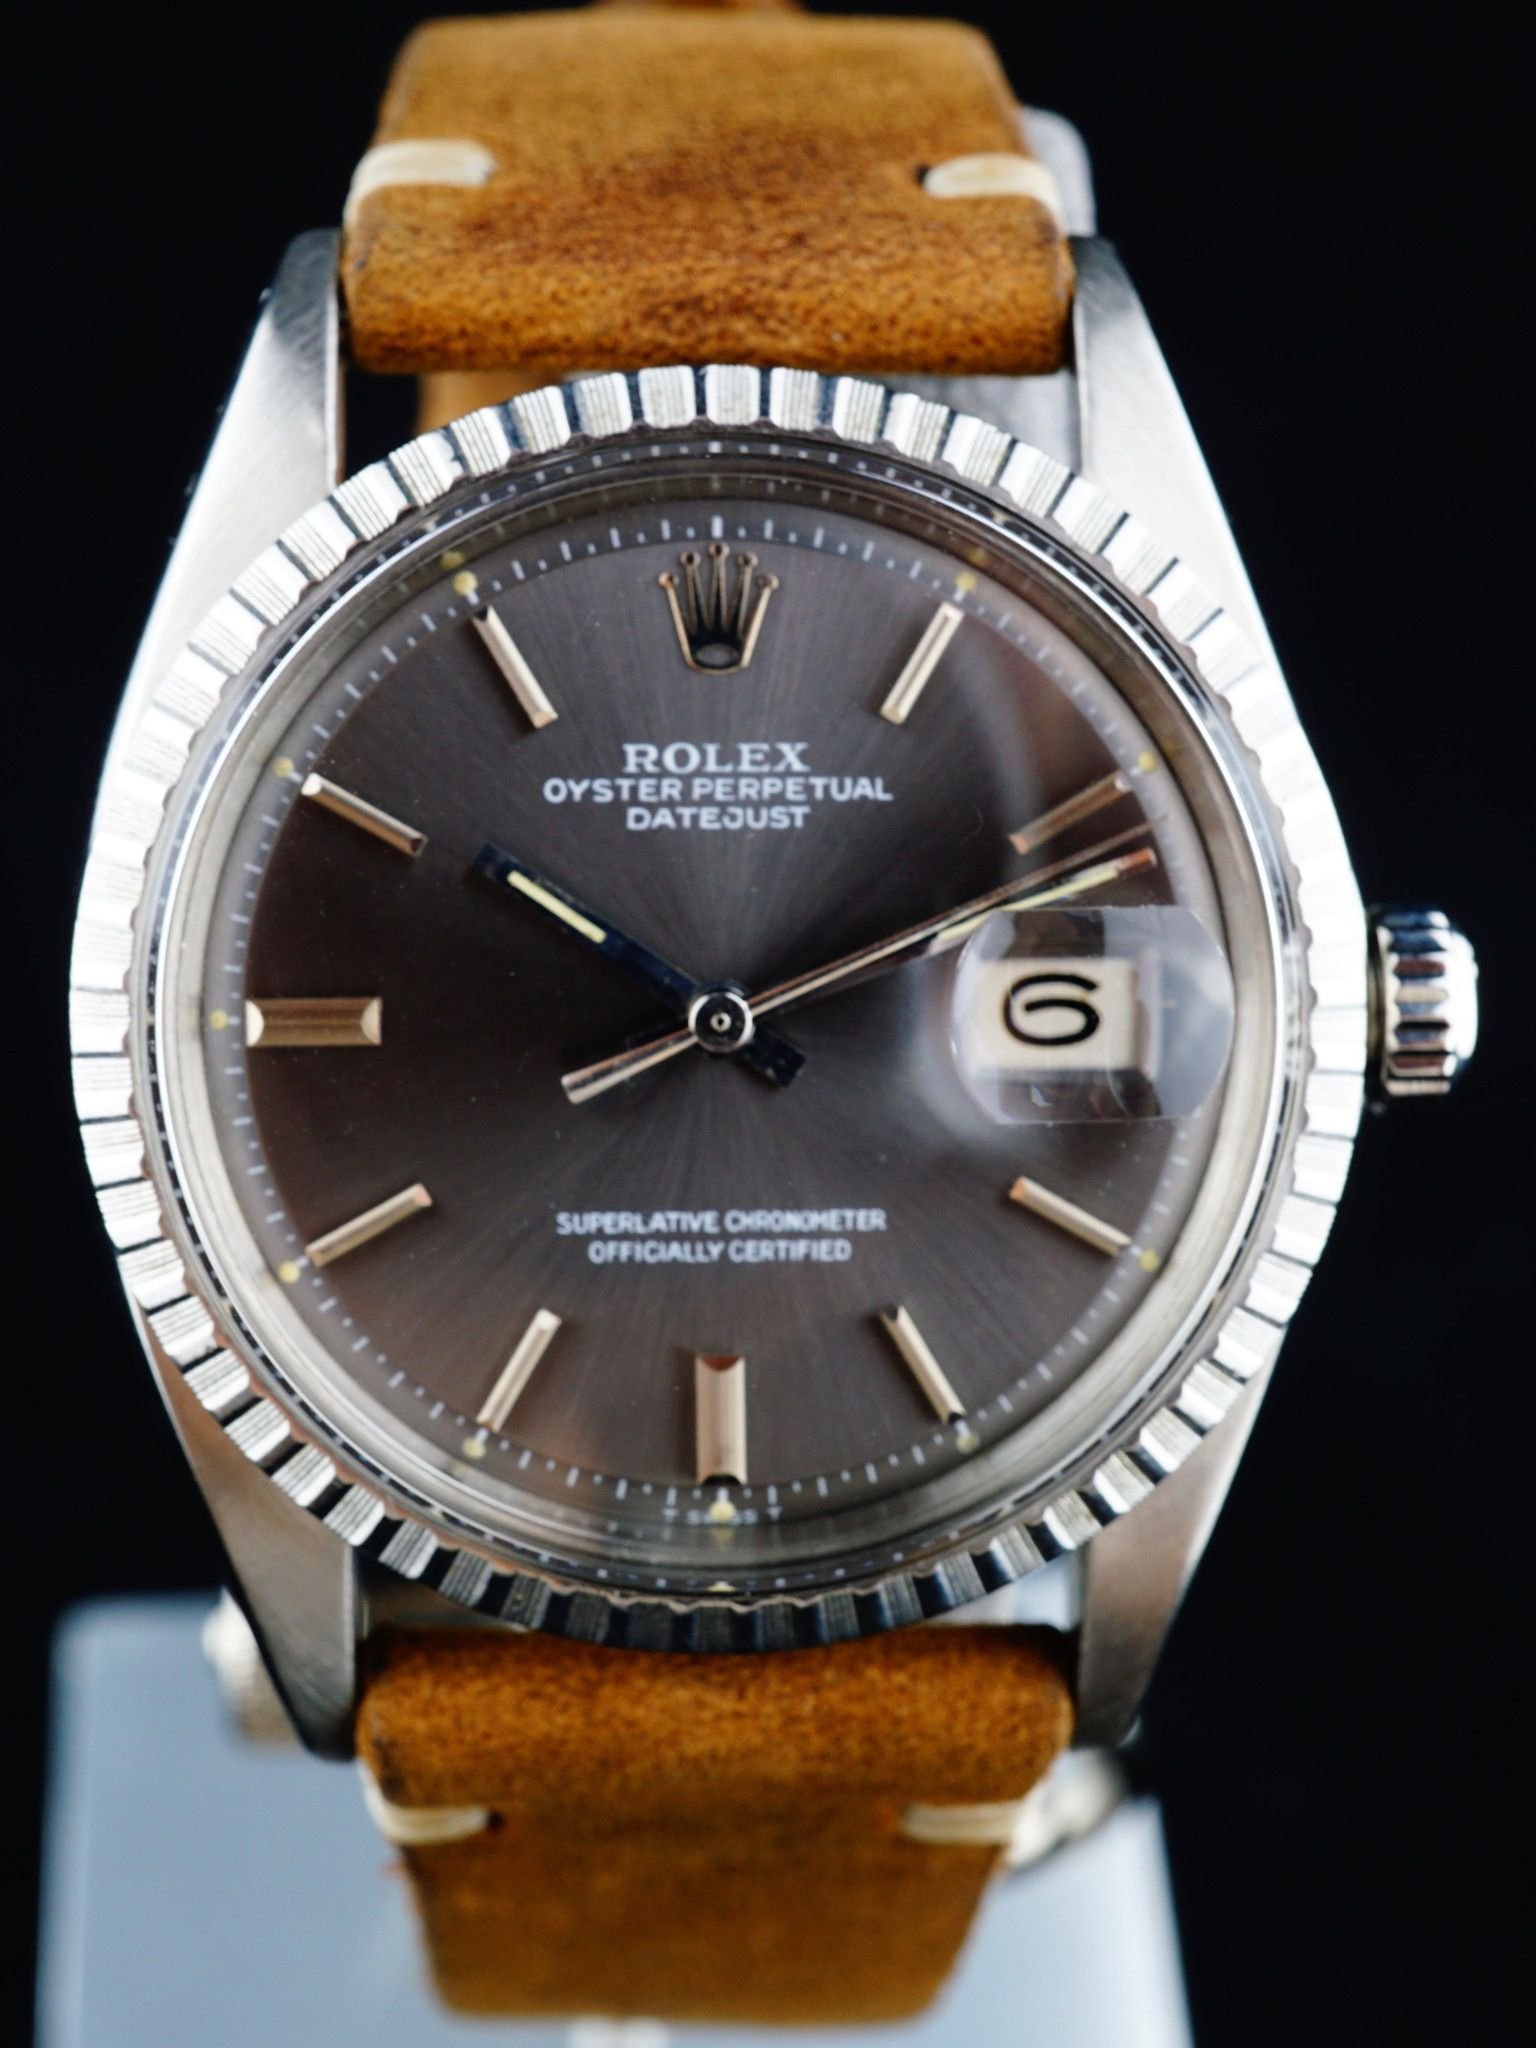 1972 Rolex Datejust Ref 1603 Grey Dial Rolex Datejust Rolex Datejust